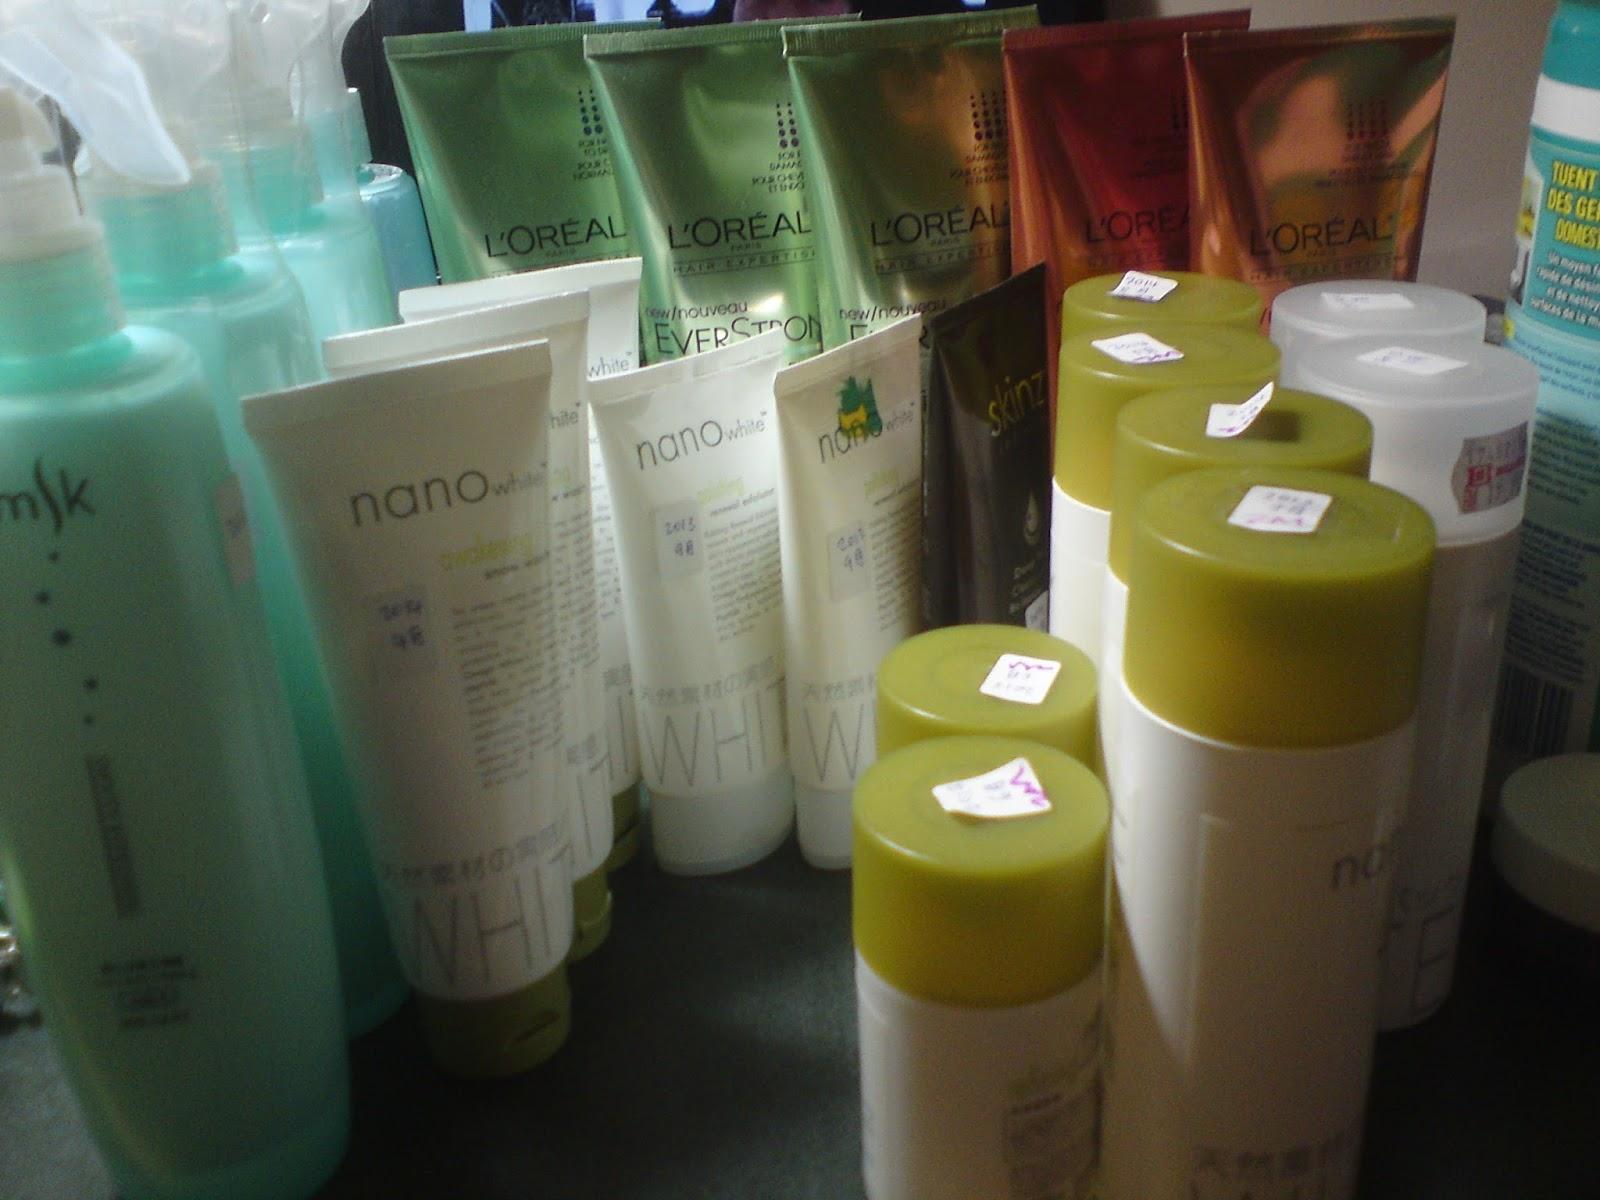 Carolyns Lavender Garden Mega Review Introducing Nano White Kao Biore Facial Foam Men S Double Scrub Cool Oil Clear 100g Skincare Line As Parts Of My Teenage Memory